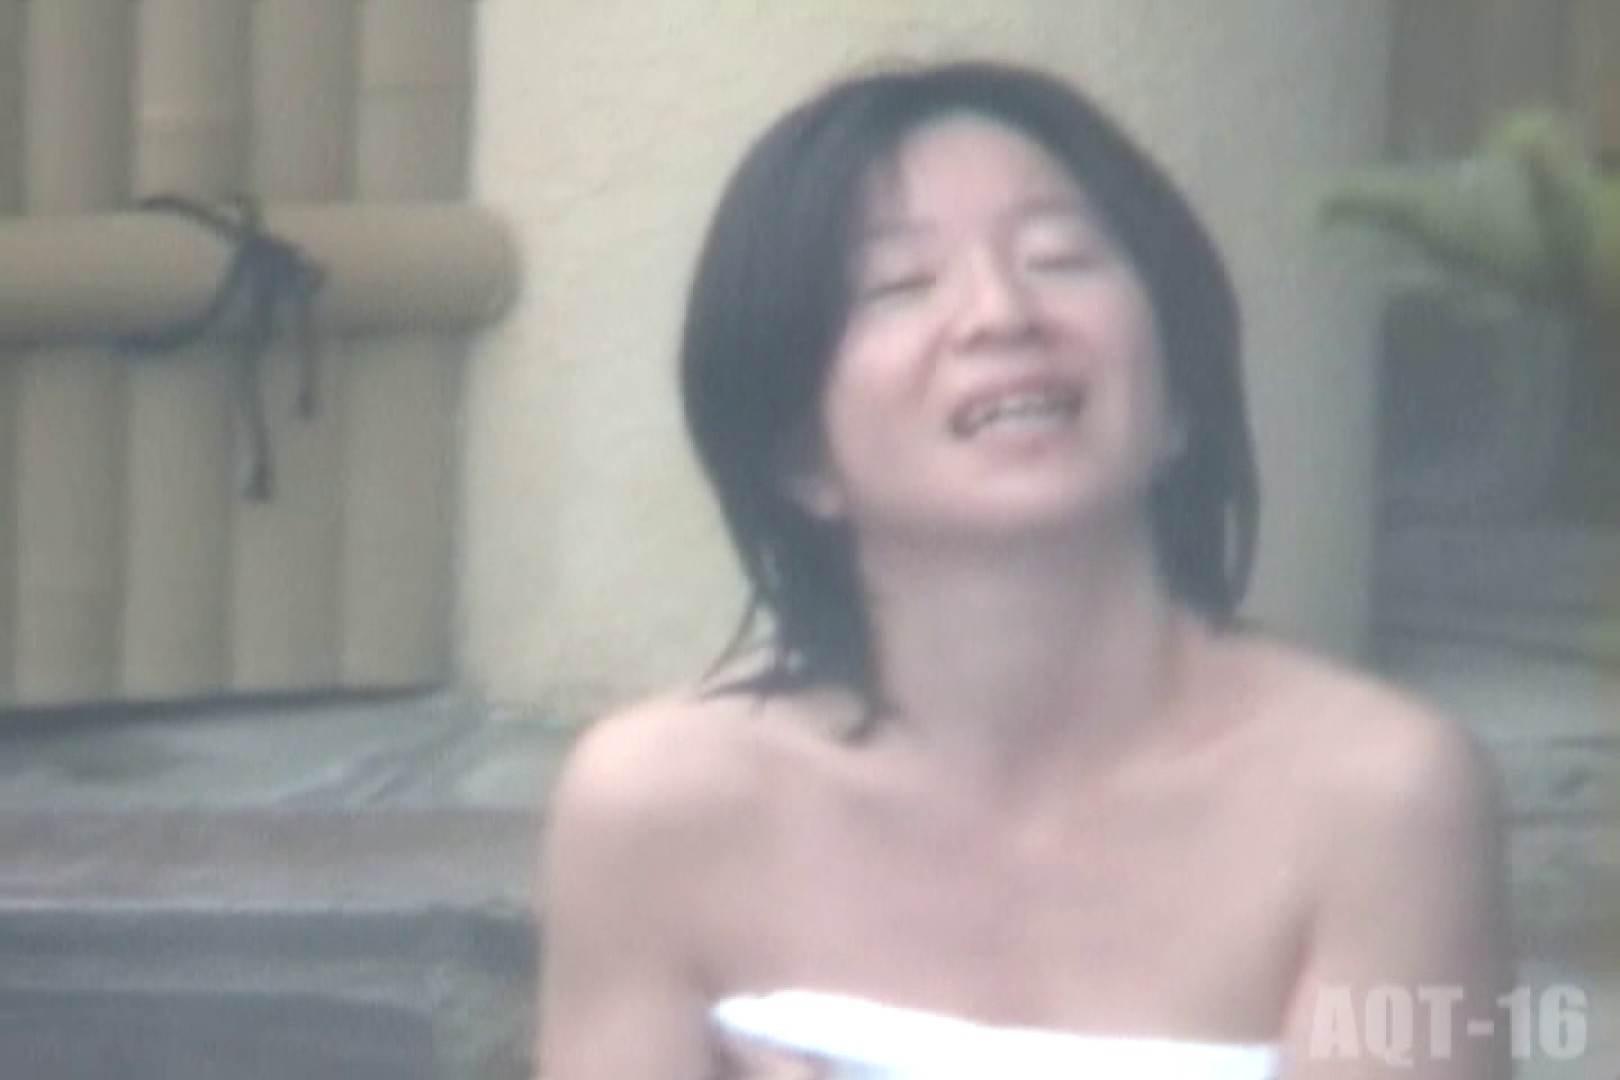 Aquaな露天風呂Vol.841 盗撮大放出 オメコ無修正動画無料 49連発 8